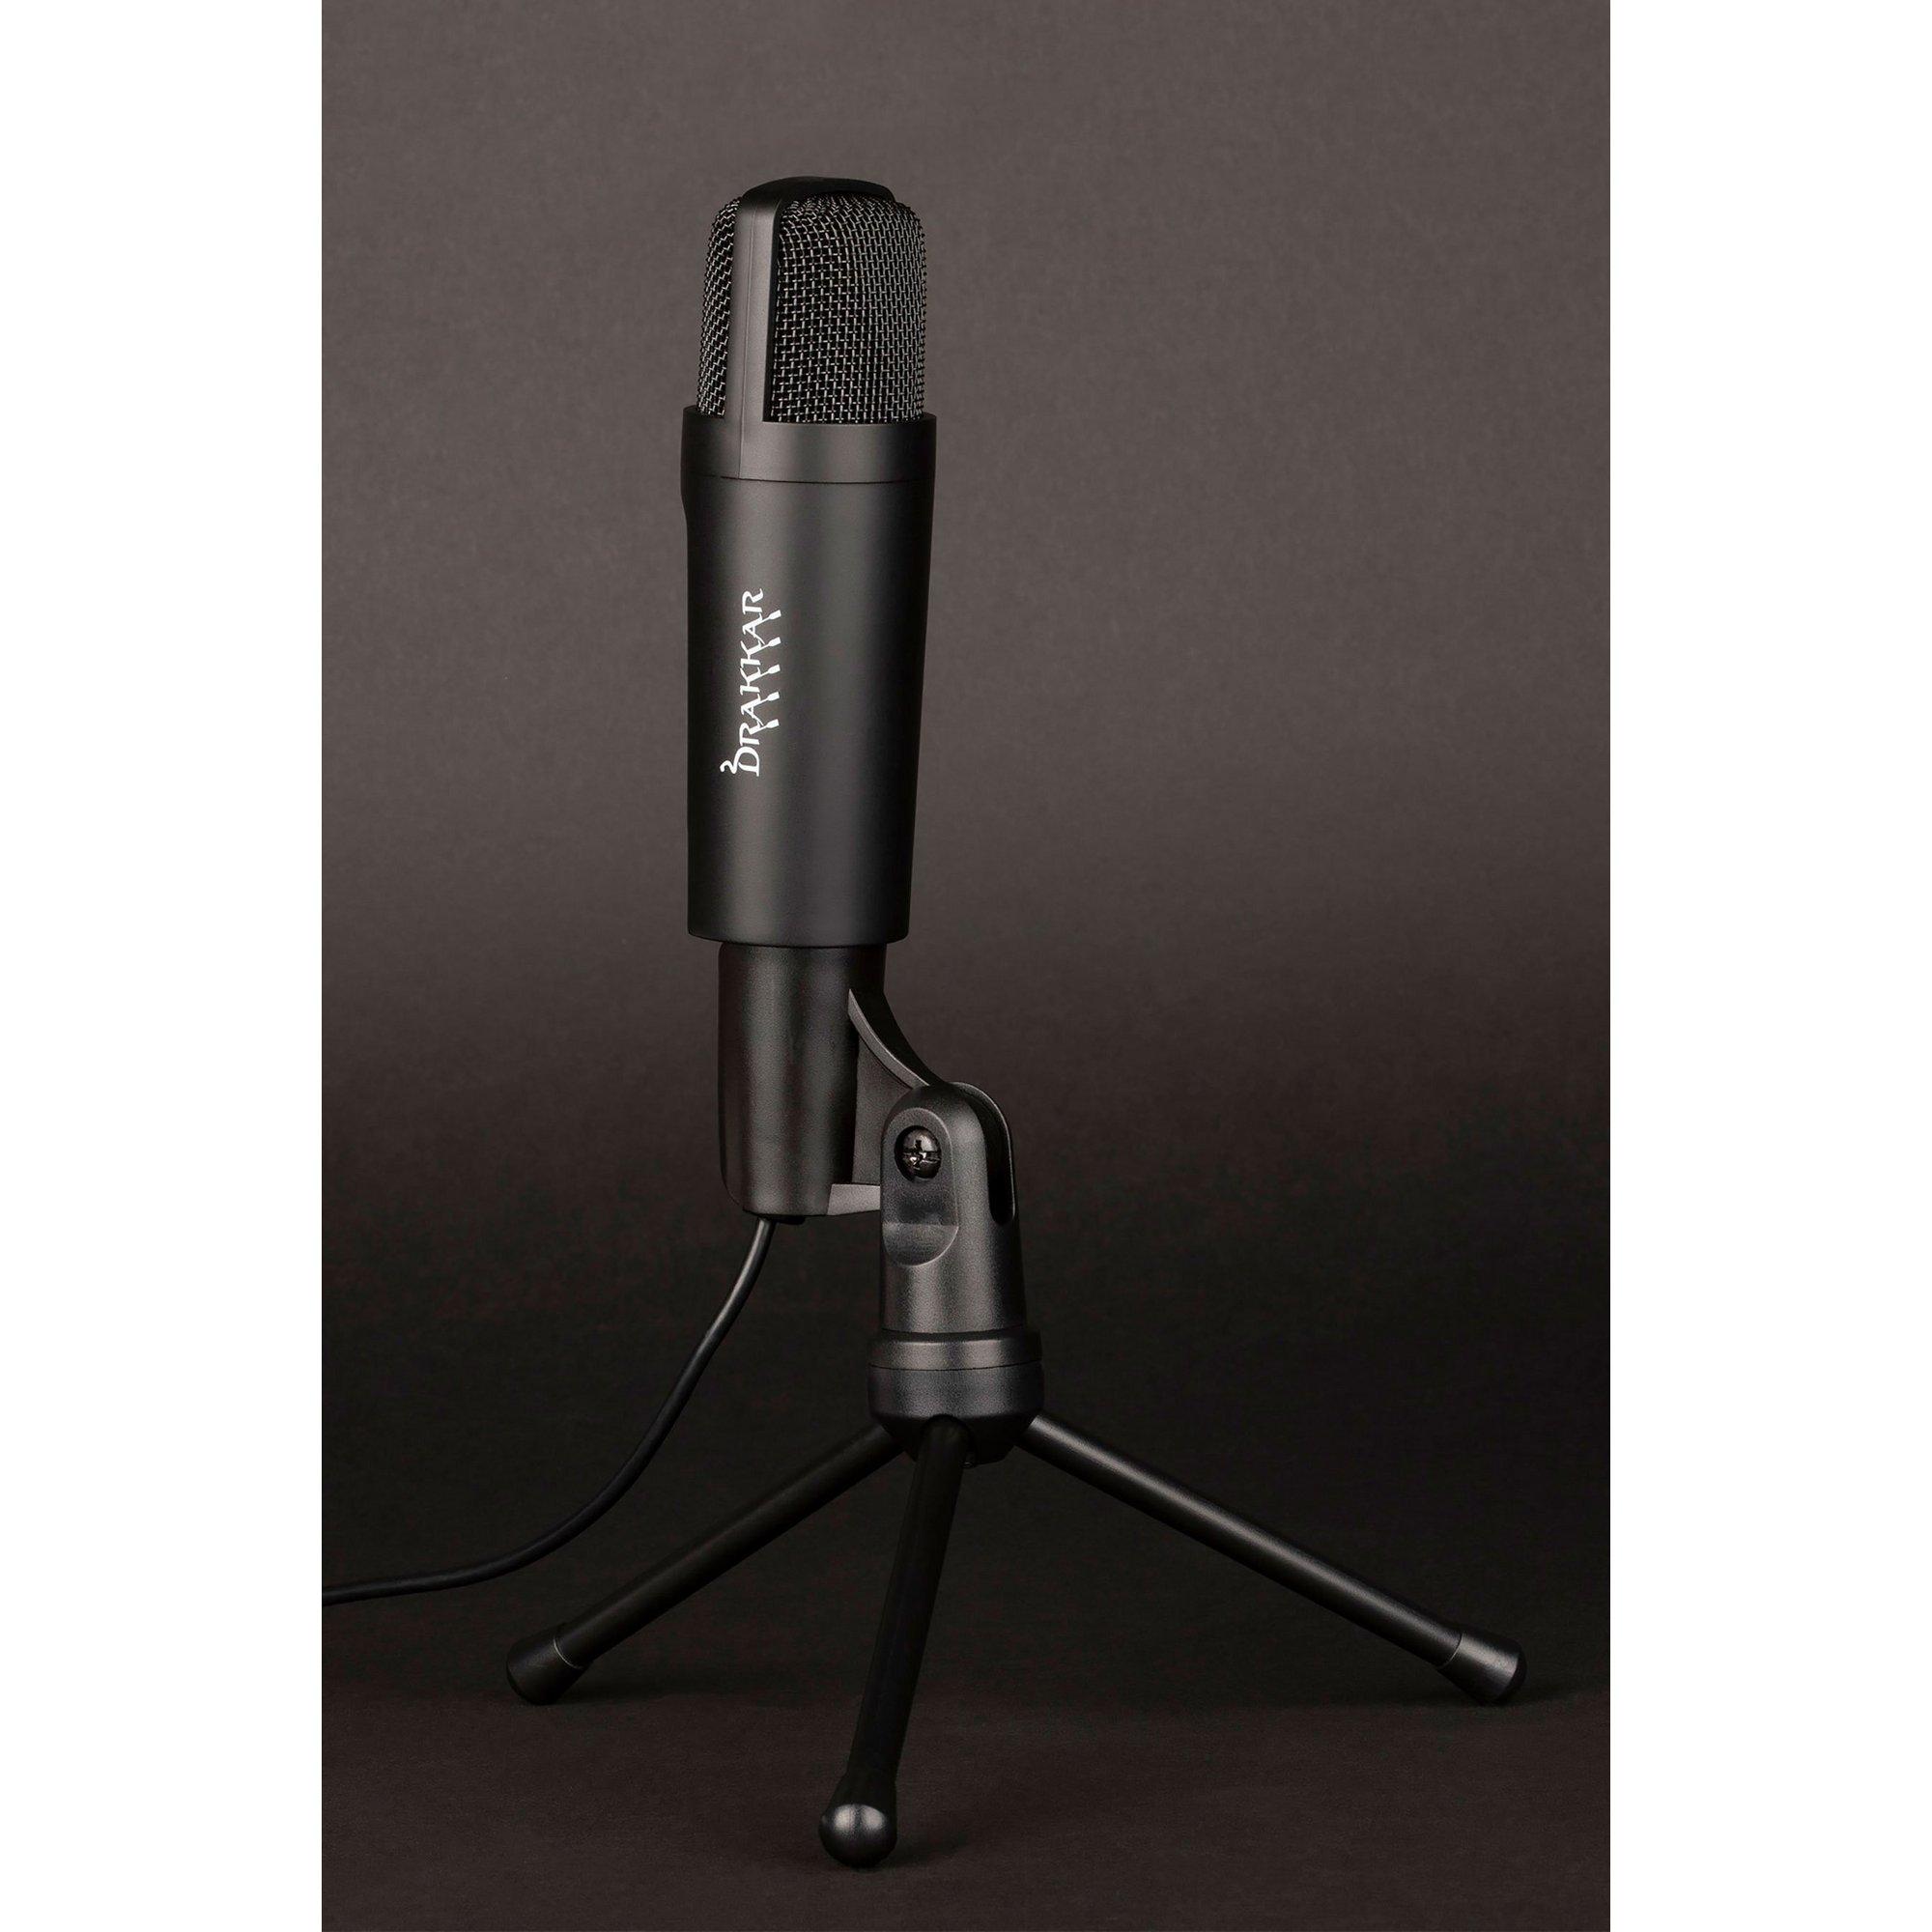 Image of Konix Drakkar Streaming and Gaming Microphone